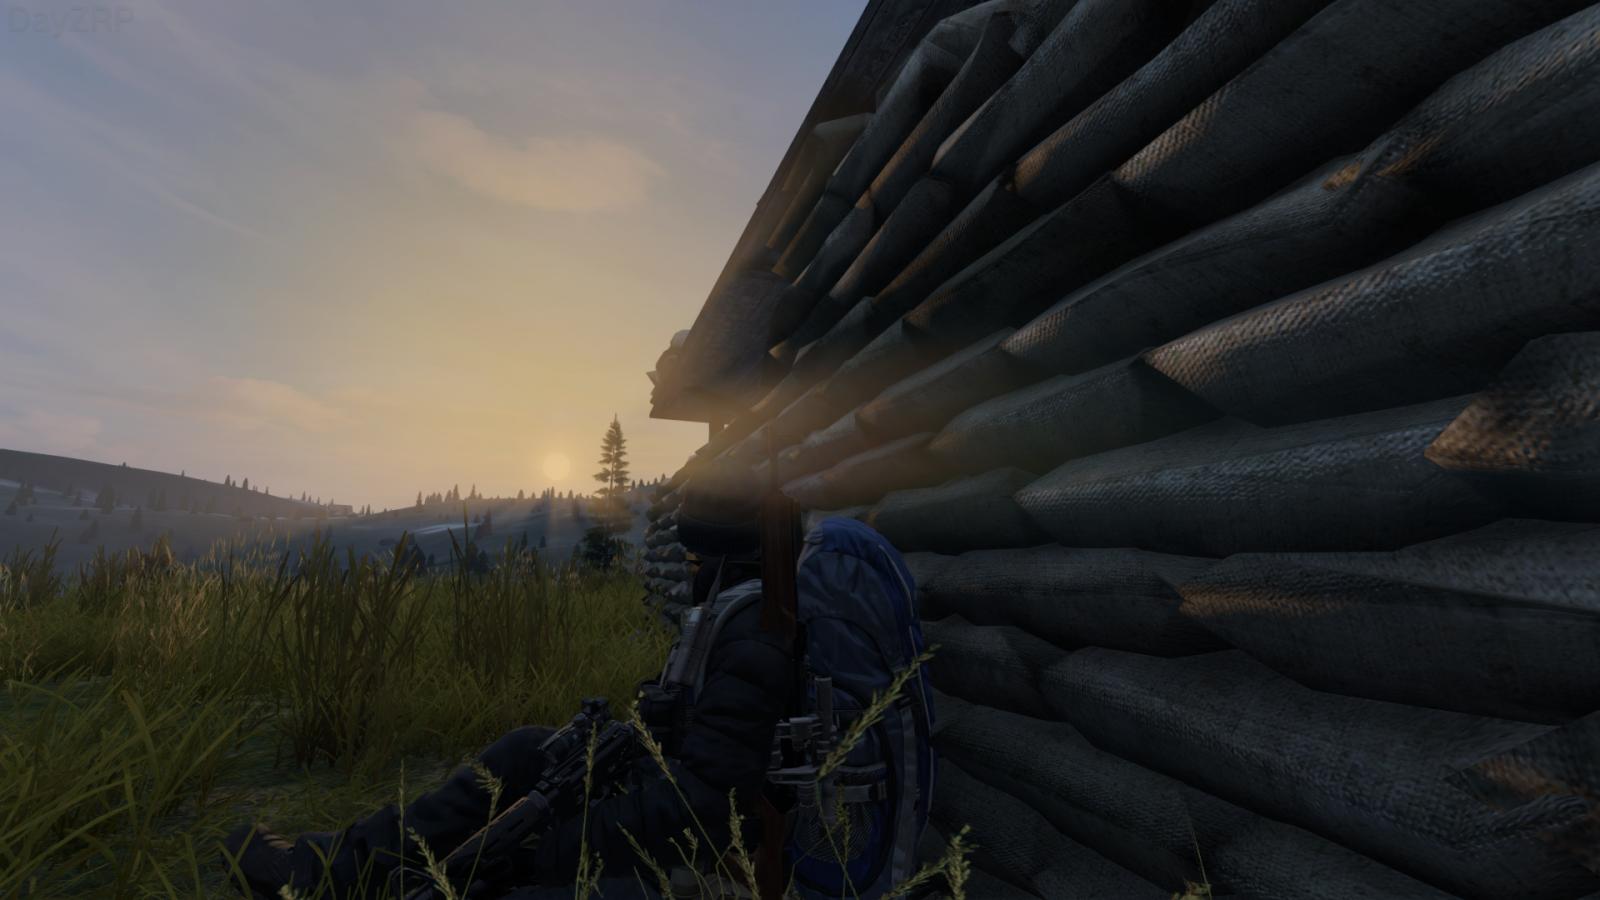 Watching the sun set over a dead world